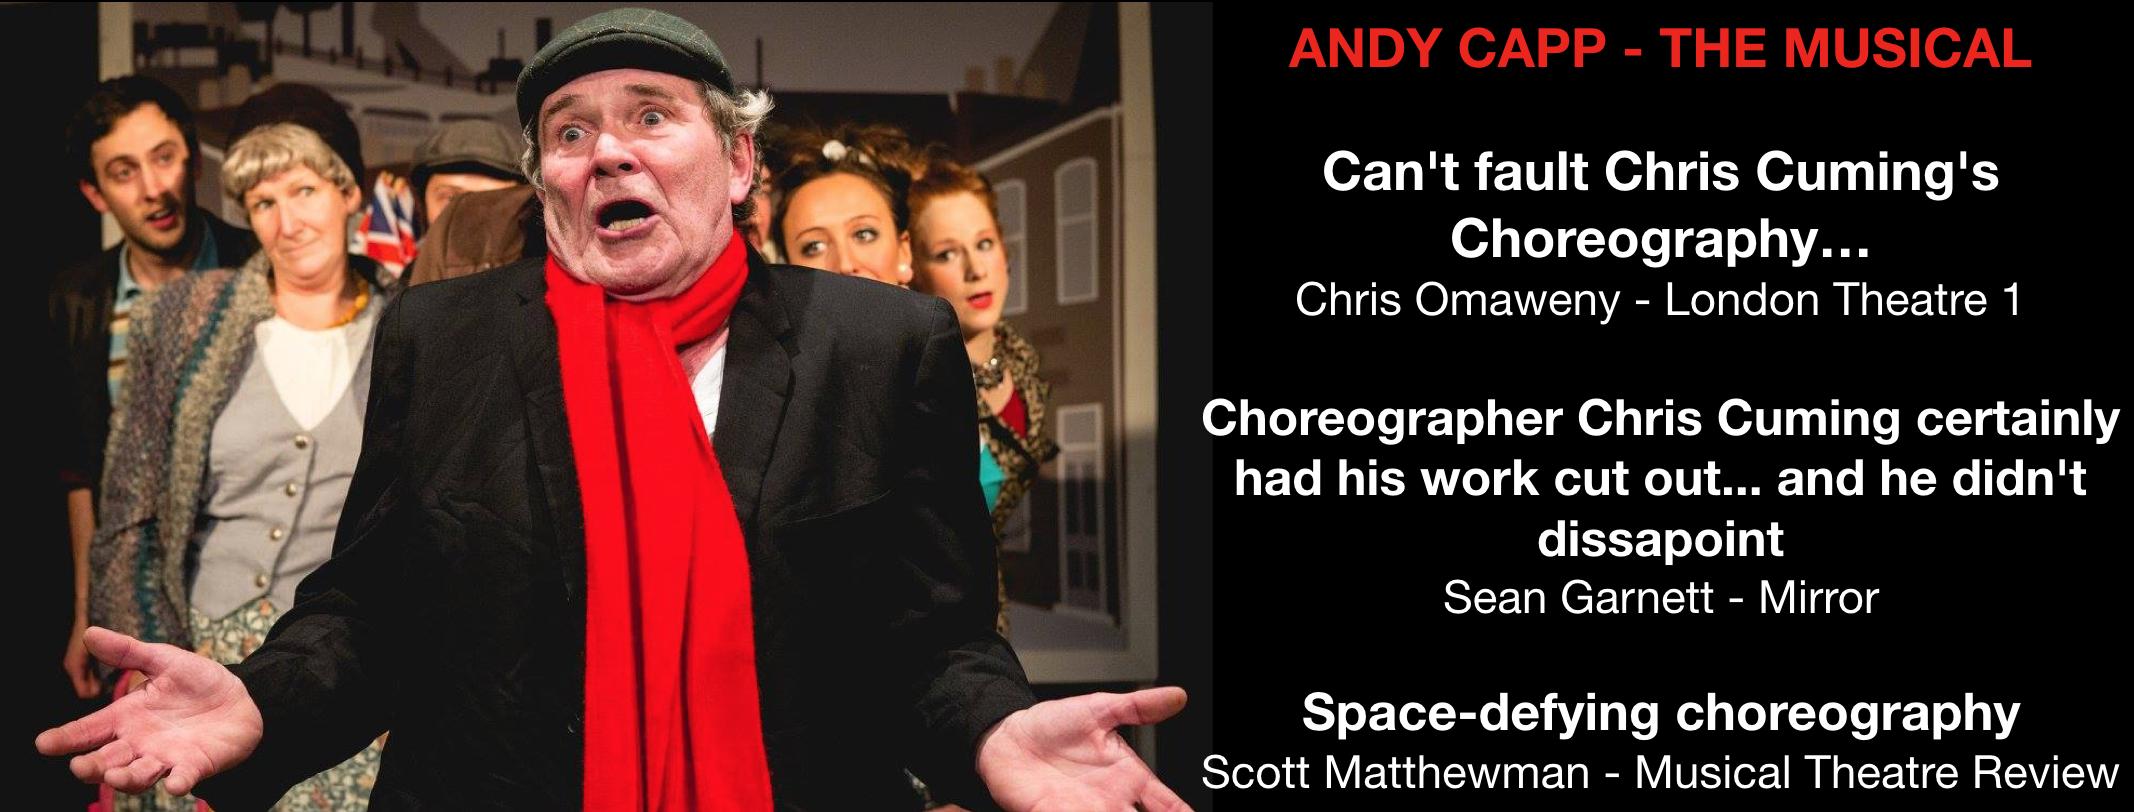 Andy Capp - Reviews